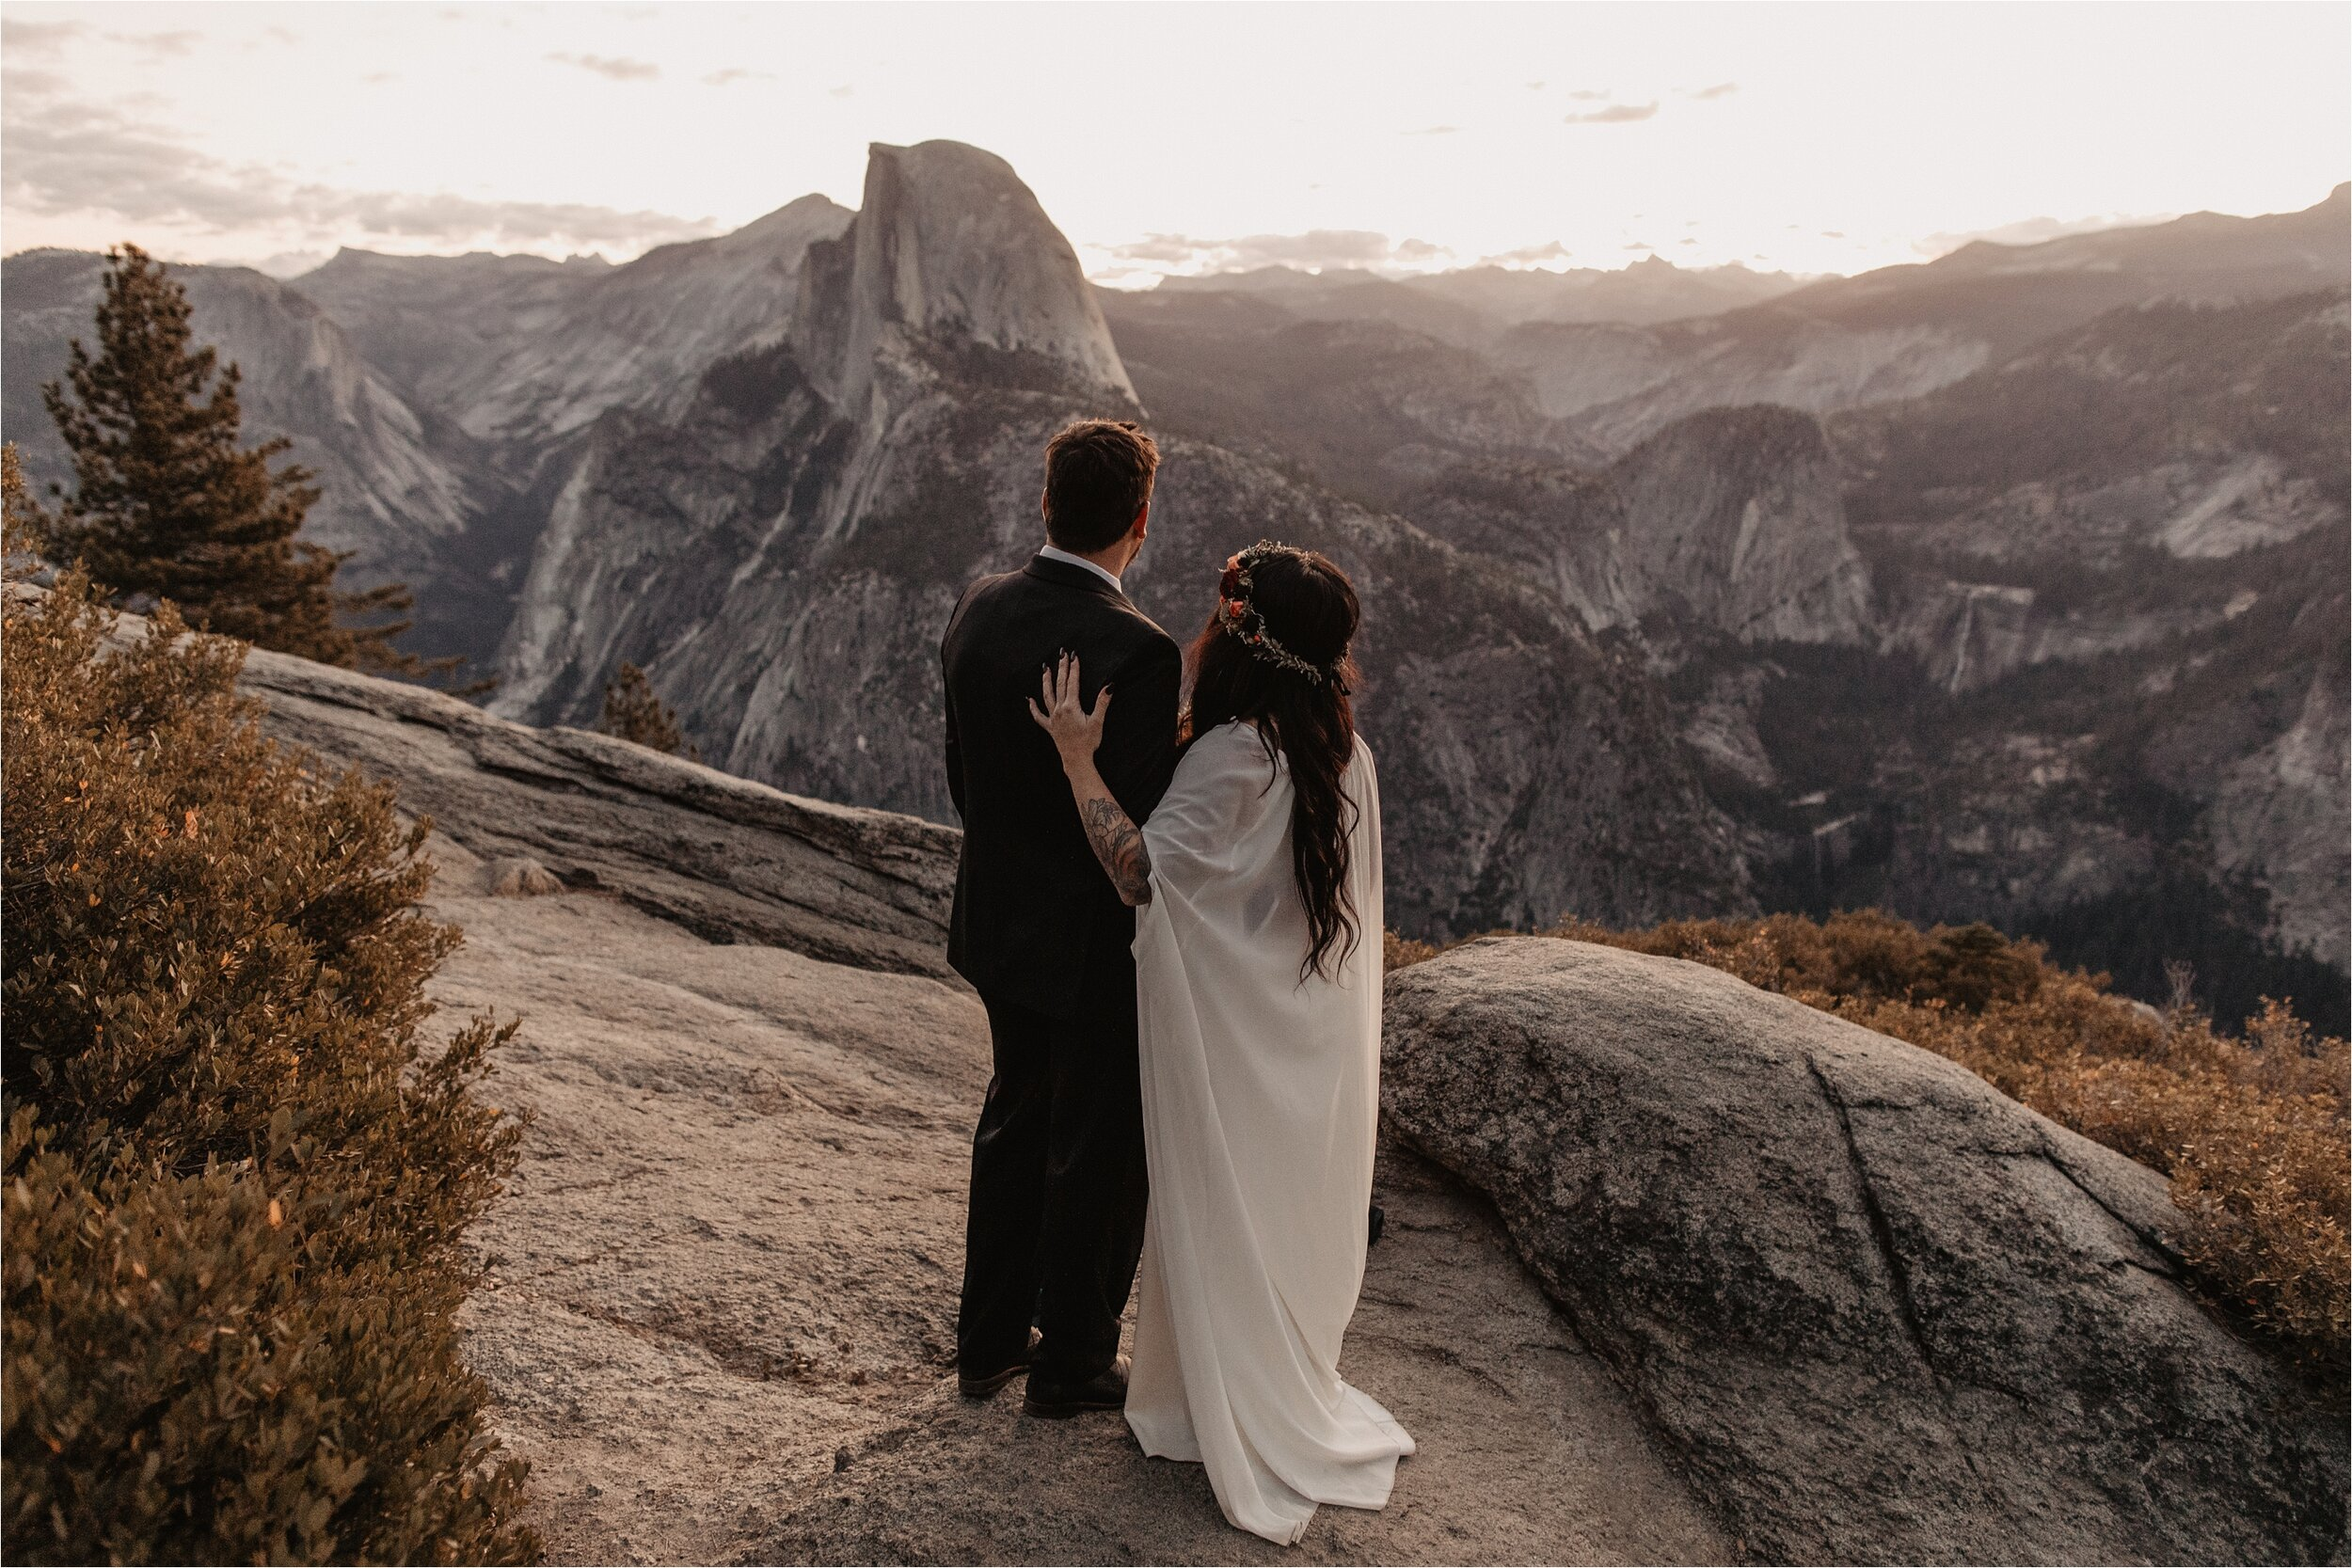 glacier-point-yosemite-elopement-ceremony_0002.jpg